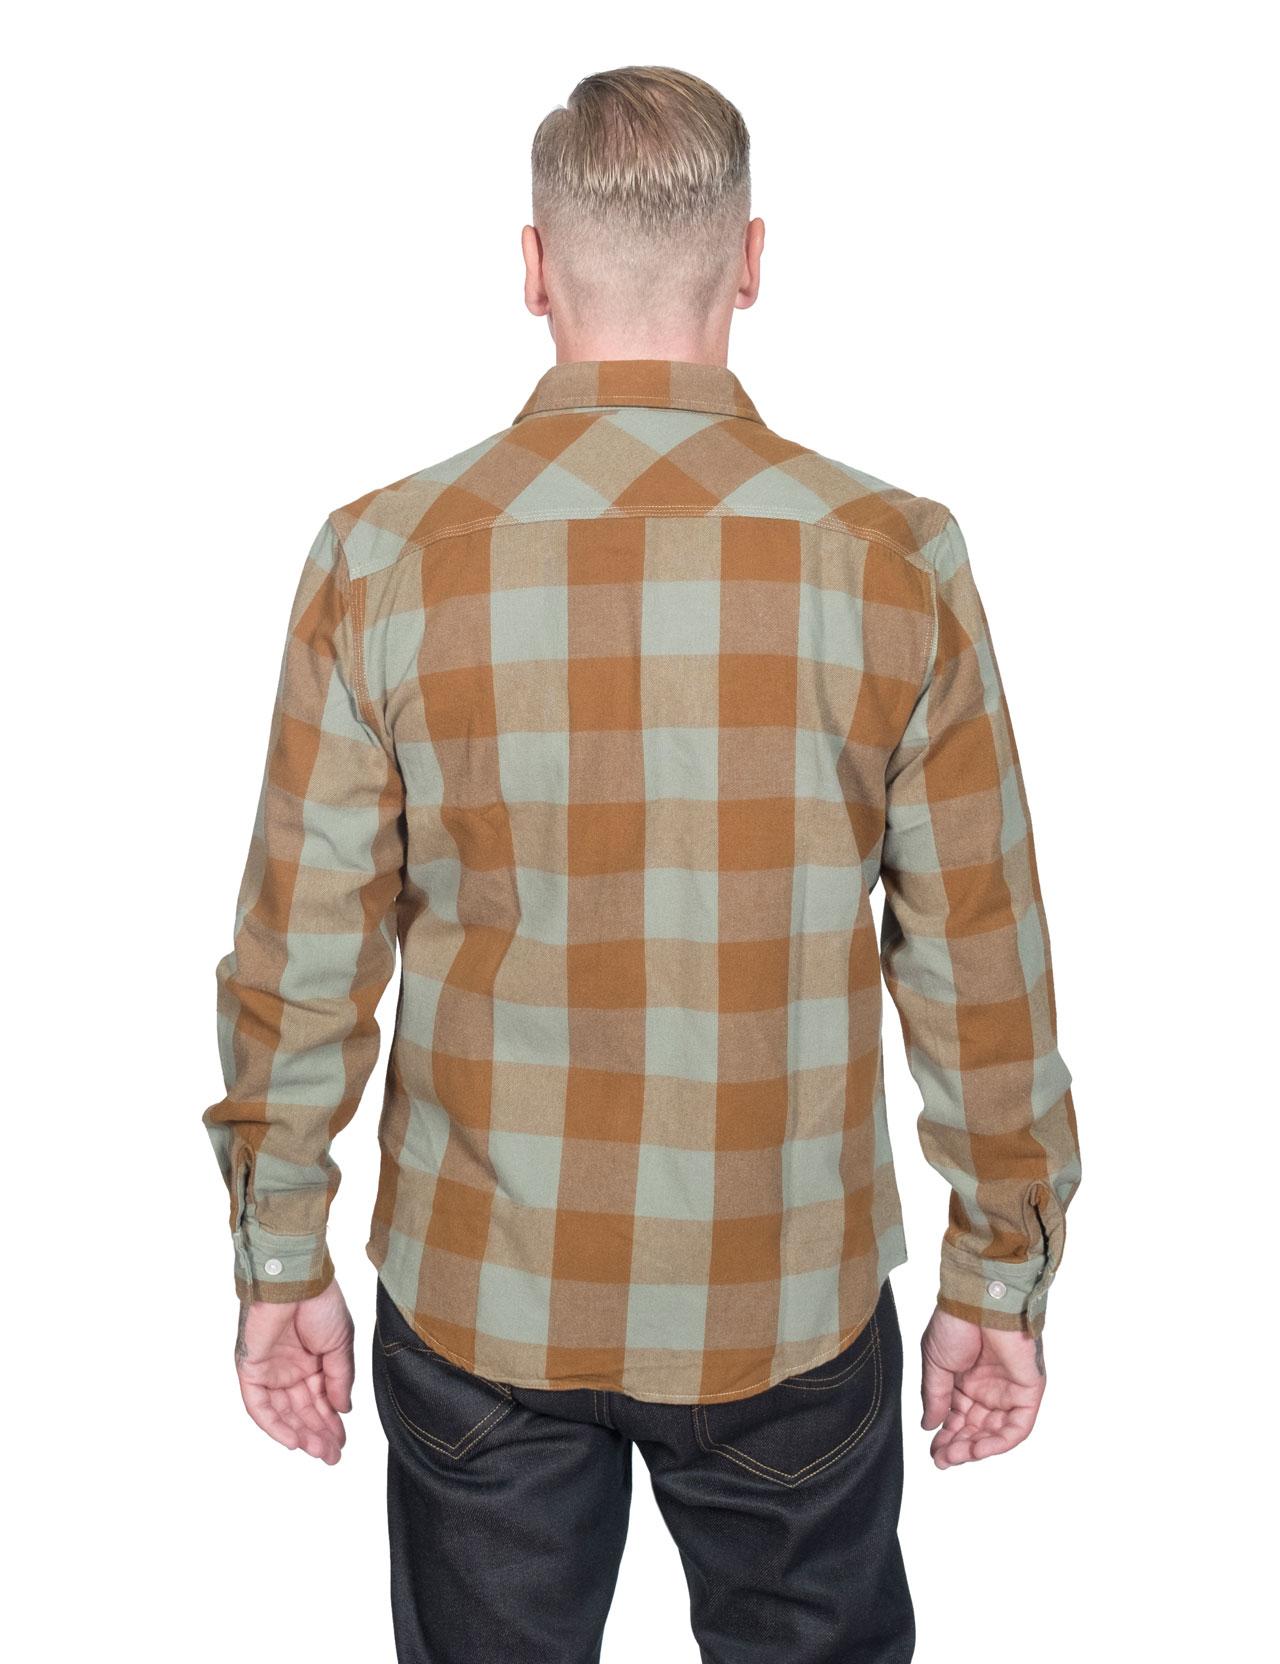 9e9f9490f31e Brixton - Bowery Flannel Shirt - Green Bay